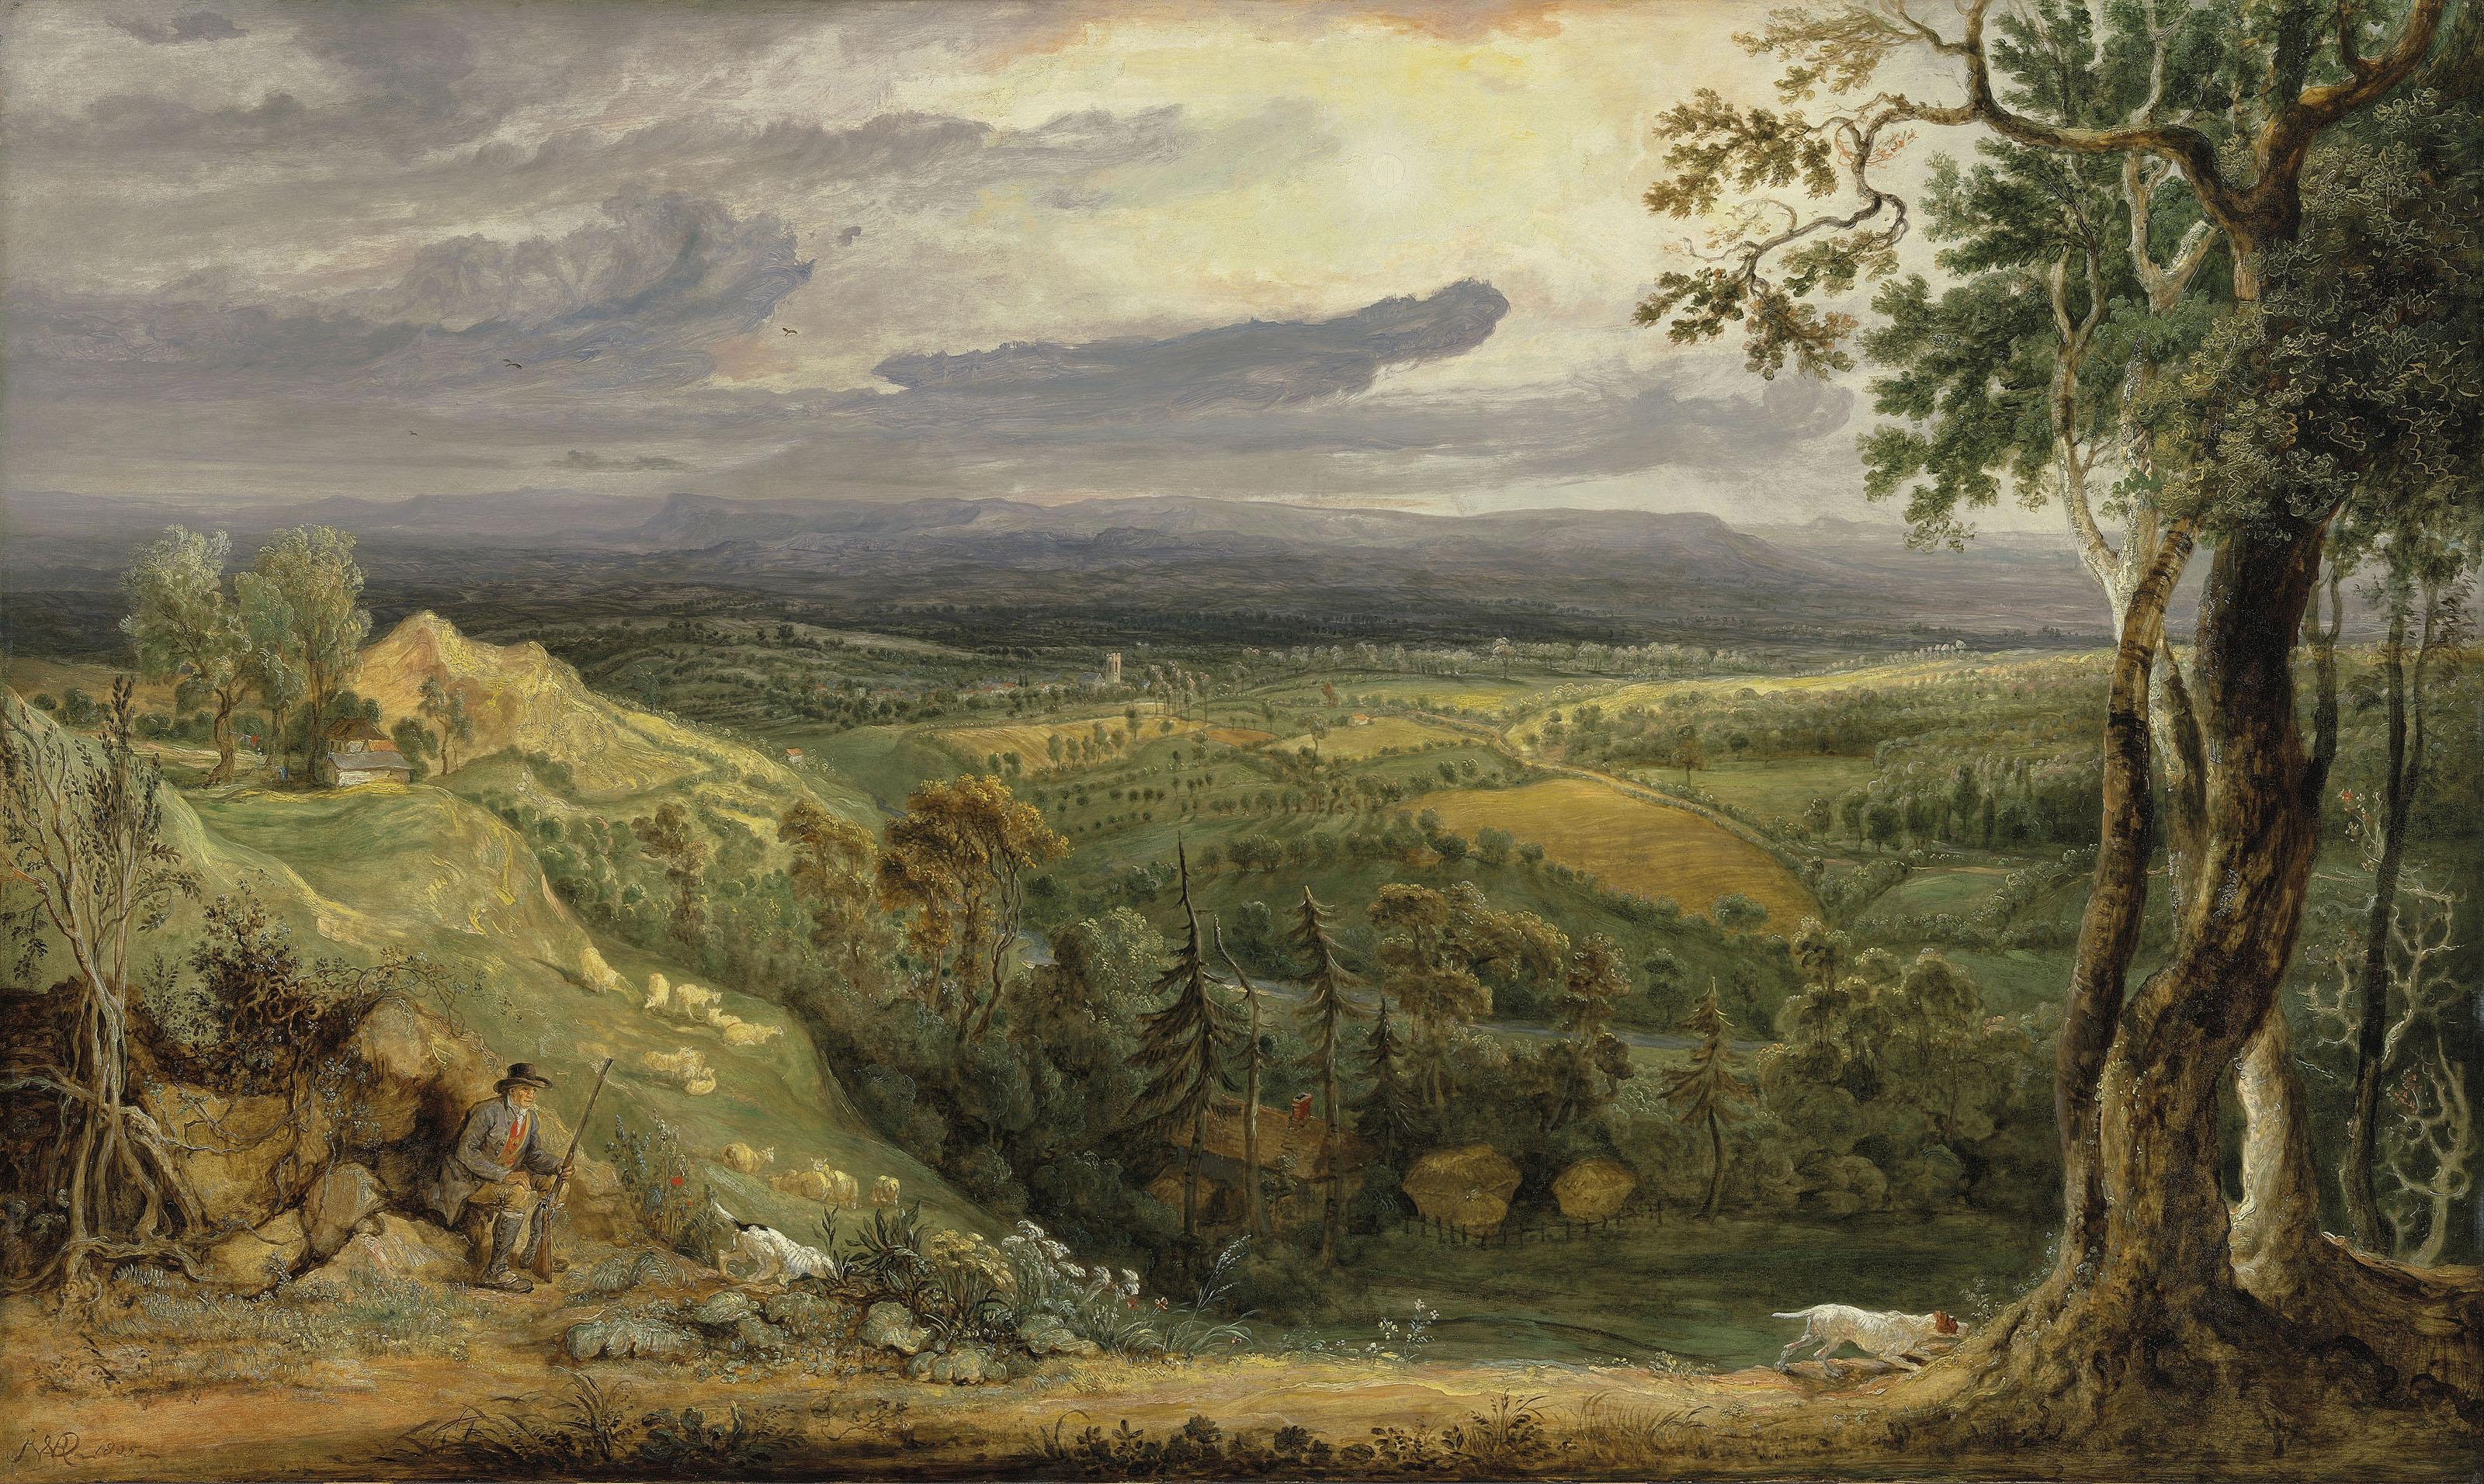 James Ward R.A. (London 1769-1859 Cheshunt)